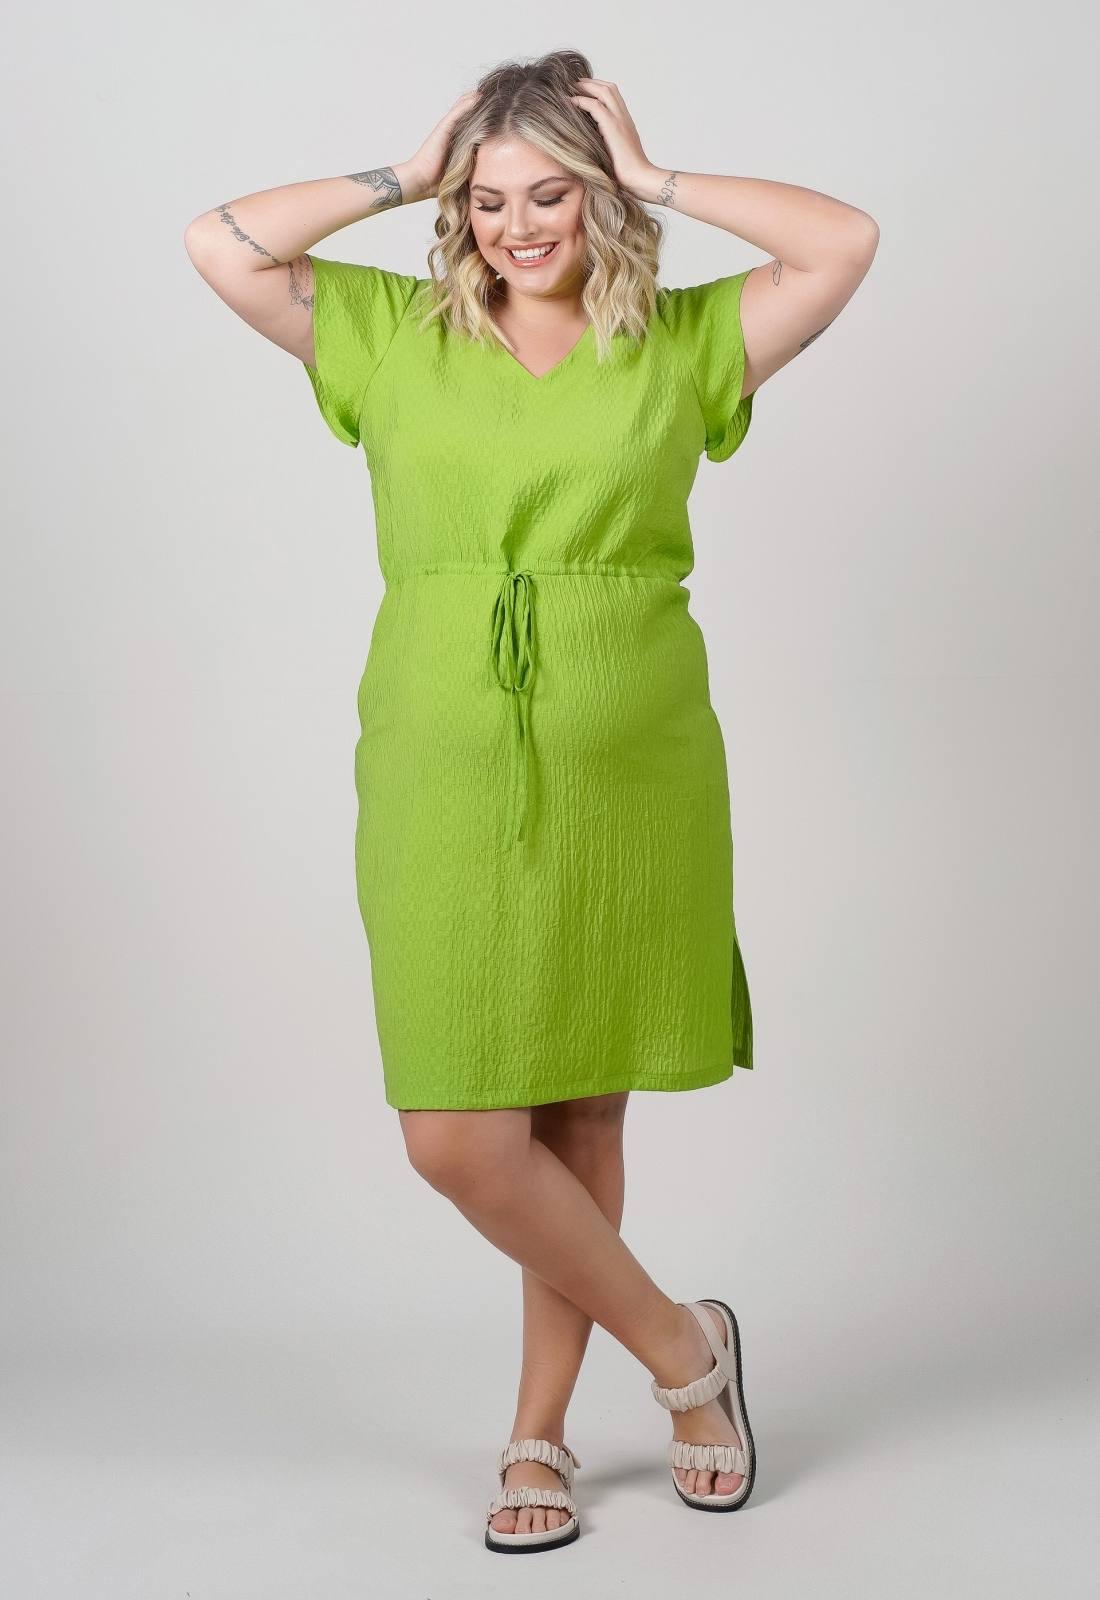 Vestido midi plus size verde Ref. U69821